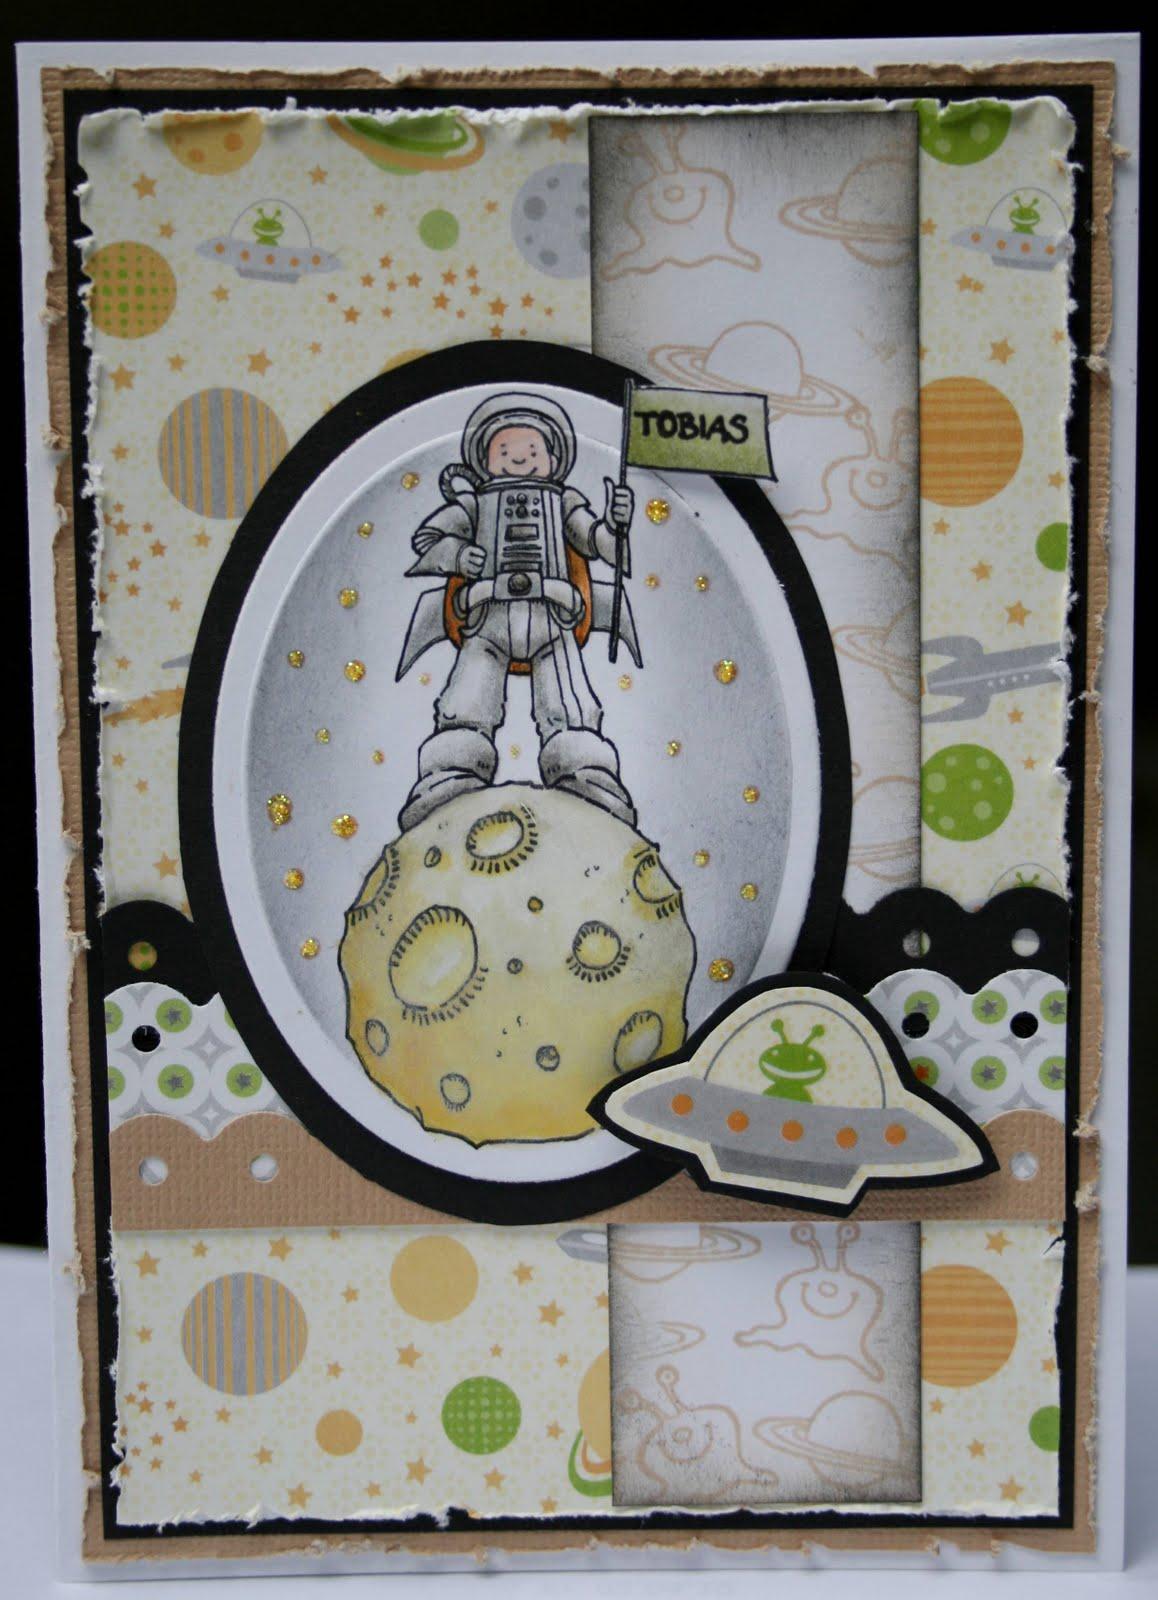 http://4.bp.blogspot.com/_vKwFMd6K_zk/S7-BbjL87tI/AAAAAAAABPg/Qm9WGMvOjmo/s1600/04-09+SpaceExplorer.JPG